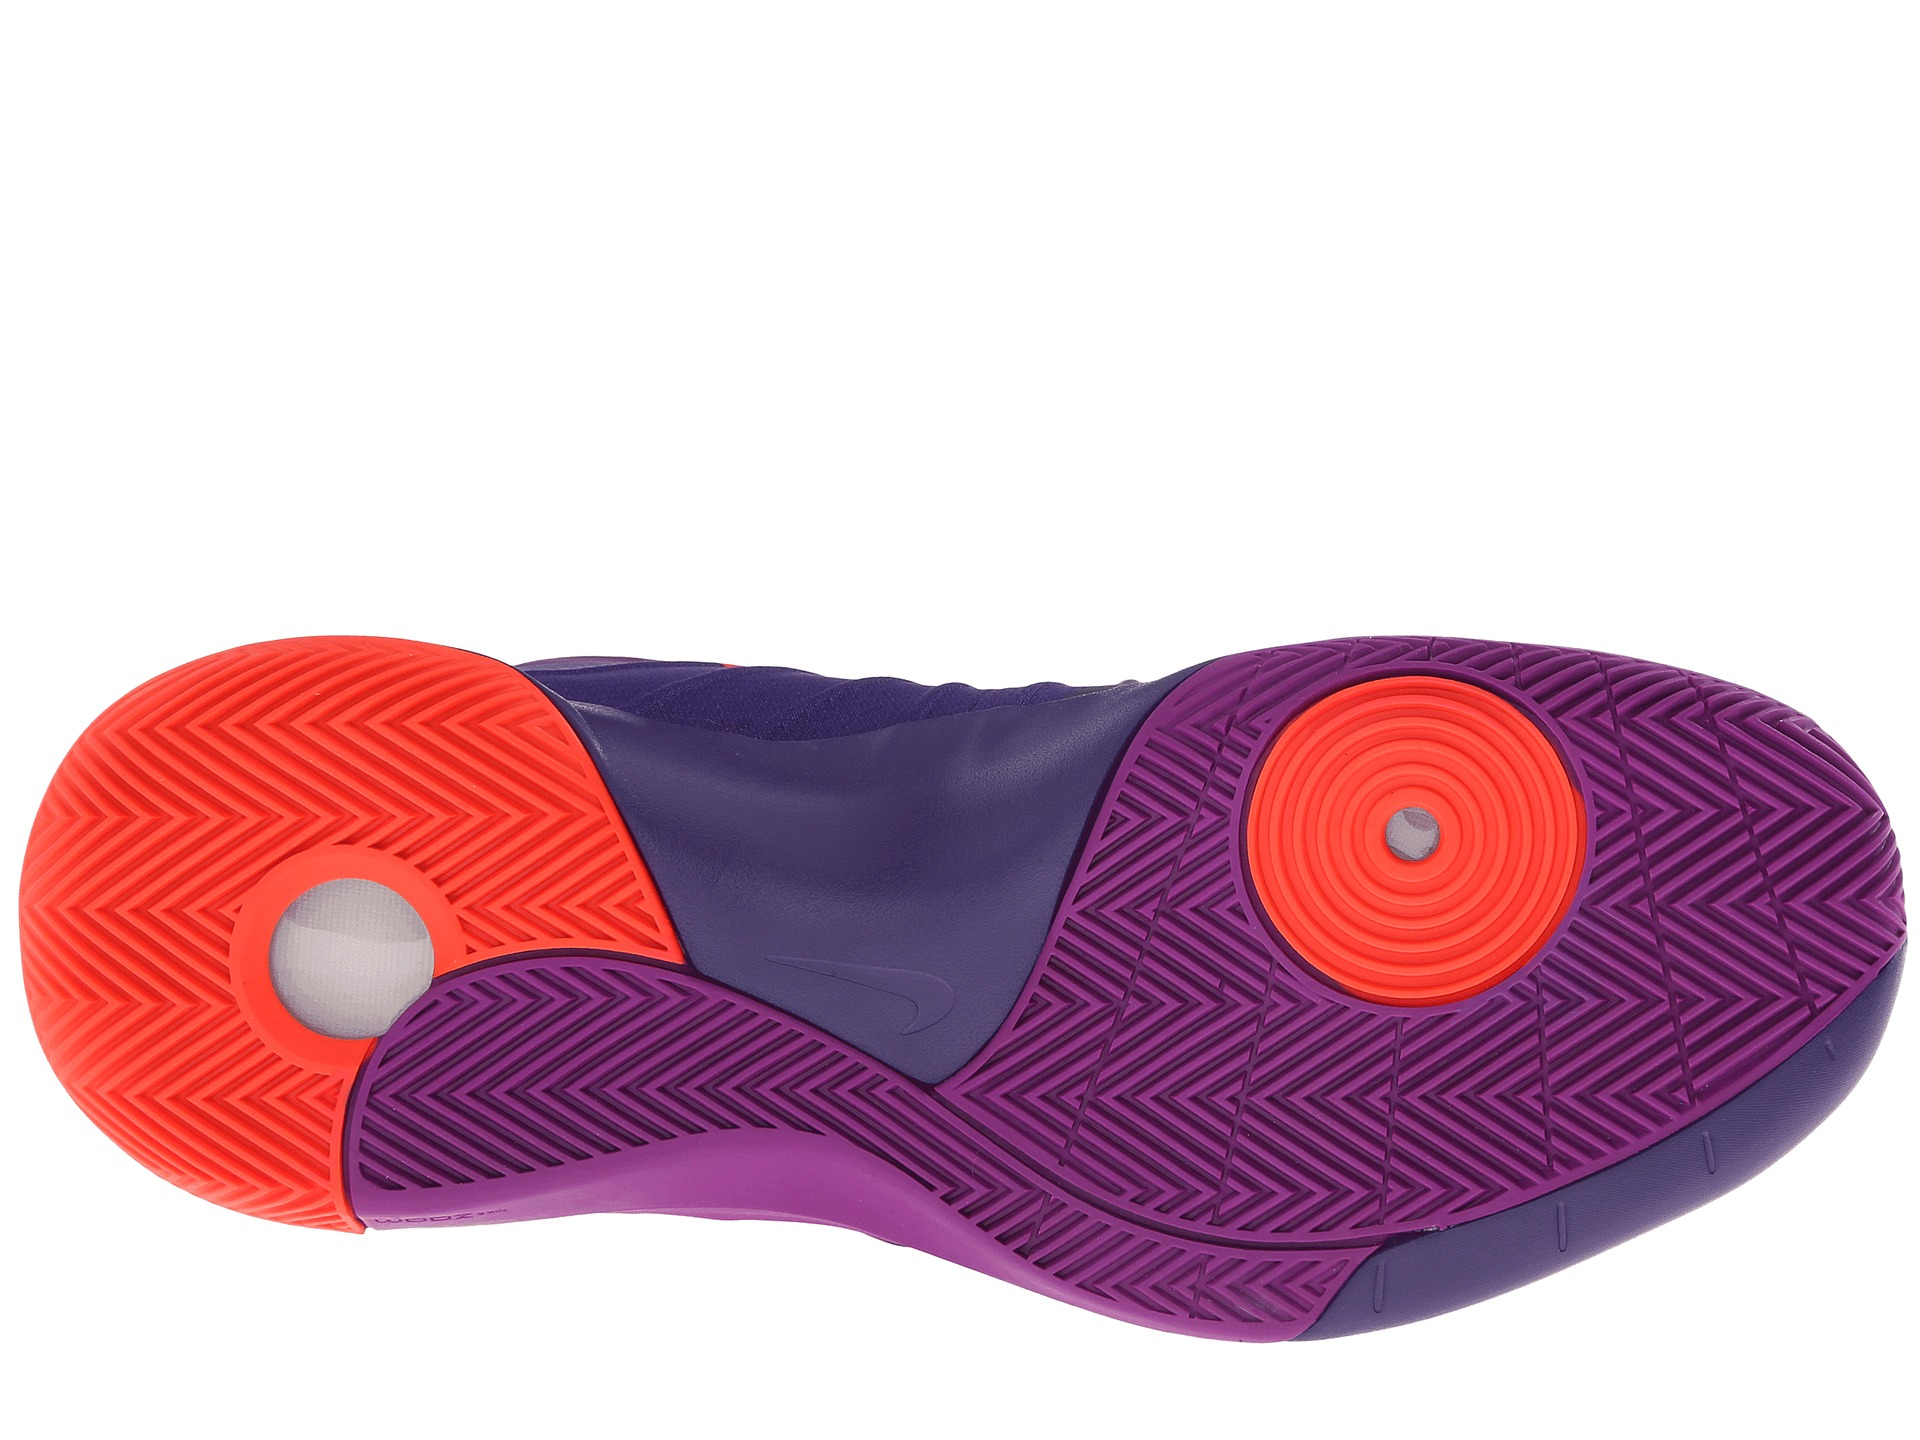 huge discount 7145a 40837 ... usa lyst nike hyperdunk 2015 in purple for men f9d82 26e24